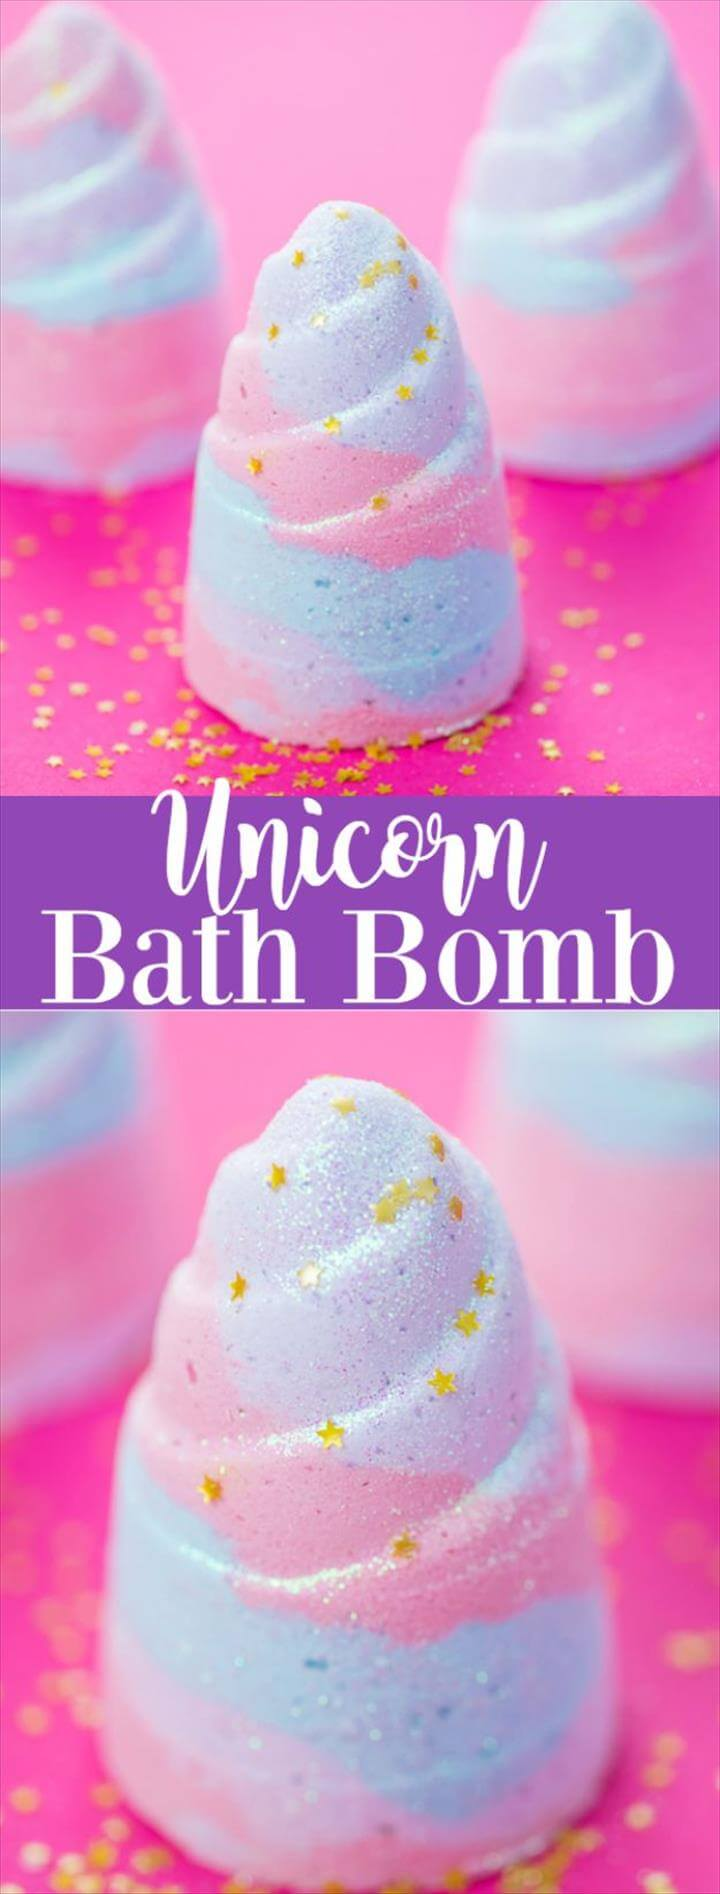 Cool DIY Bath Bombs to Make At Home - Unicorn Bath Bomb - Recipes and Tutorial